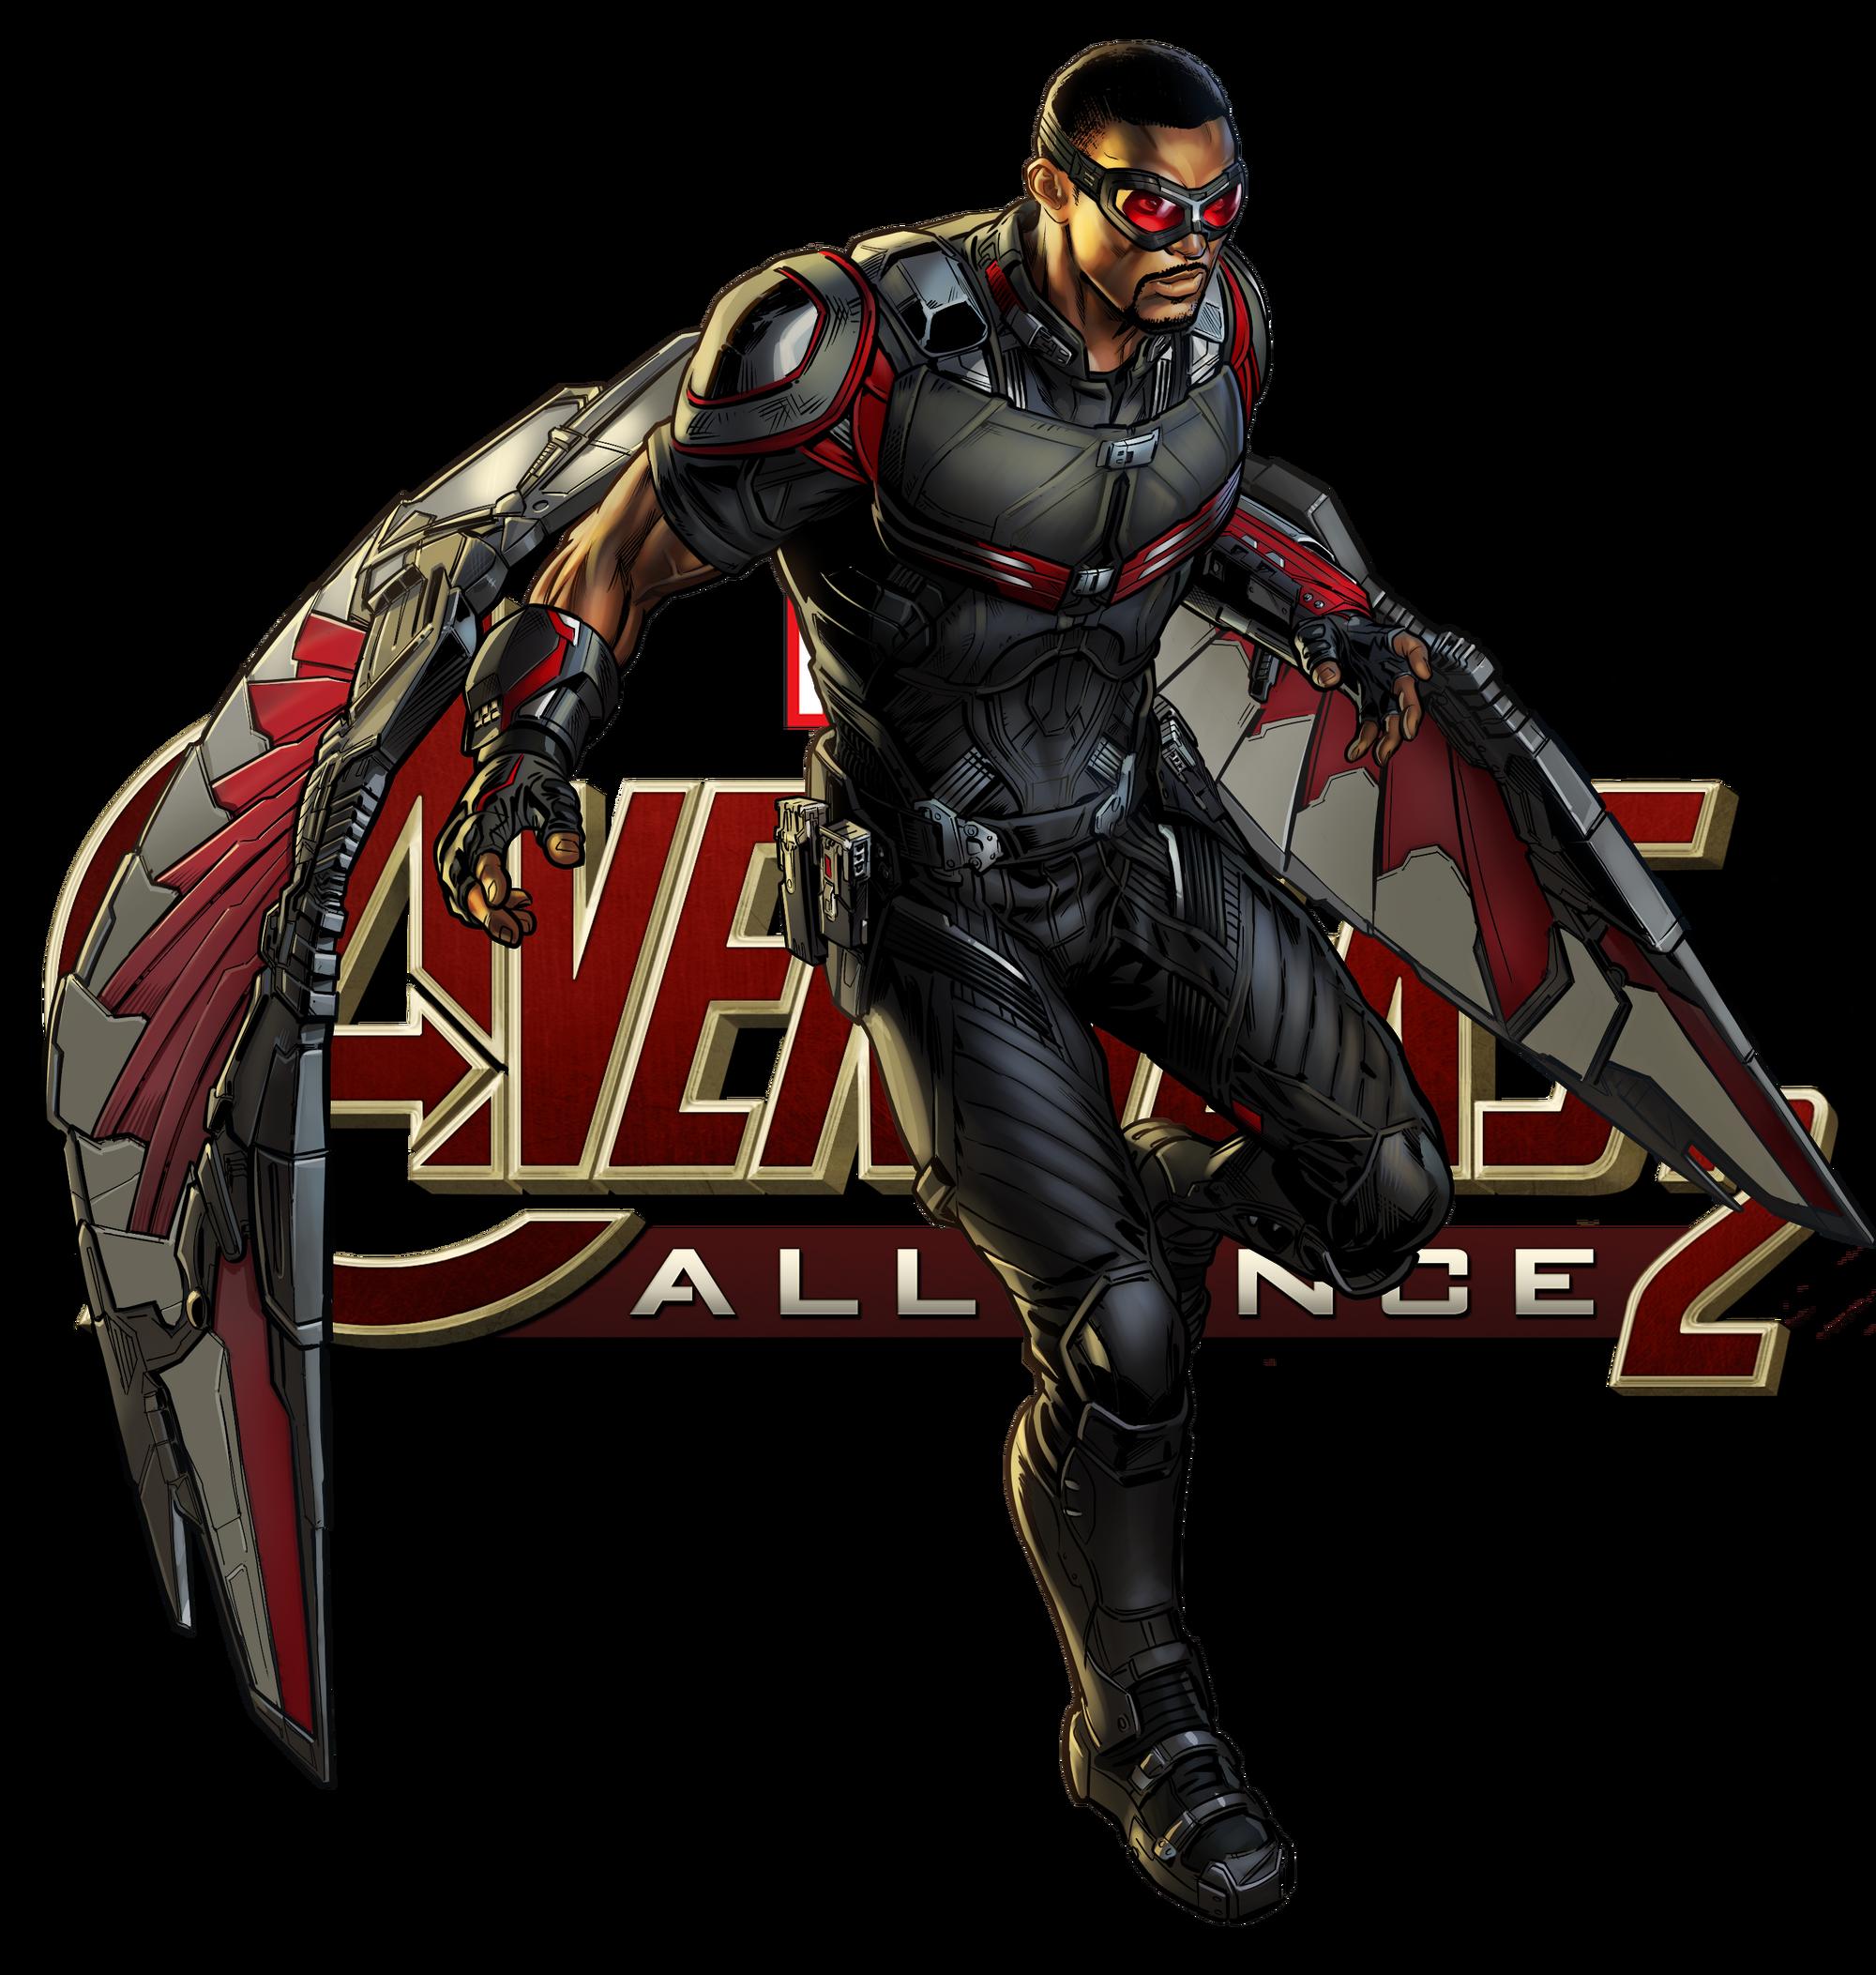 Falcon marvel avengers alliance 2 wikia fandom - Faucon avengers ...